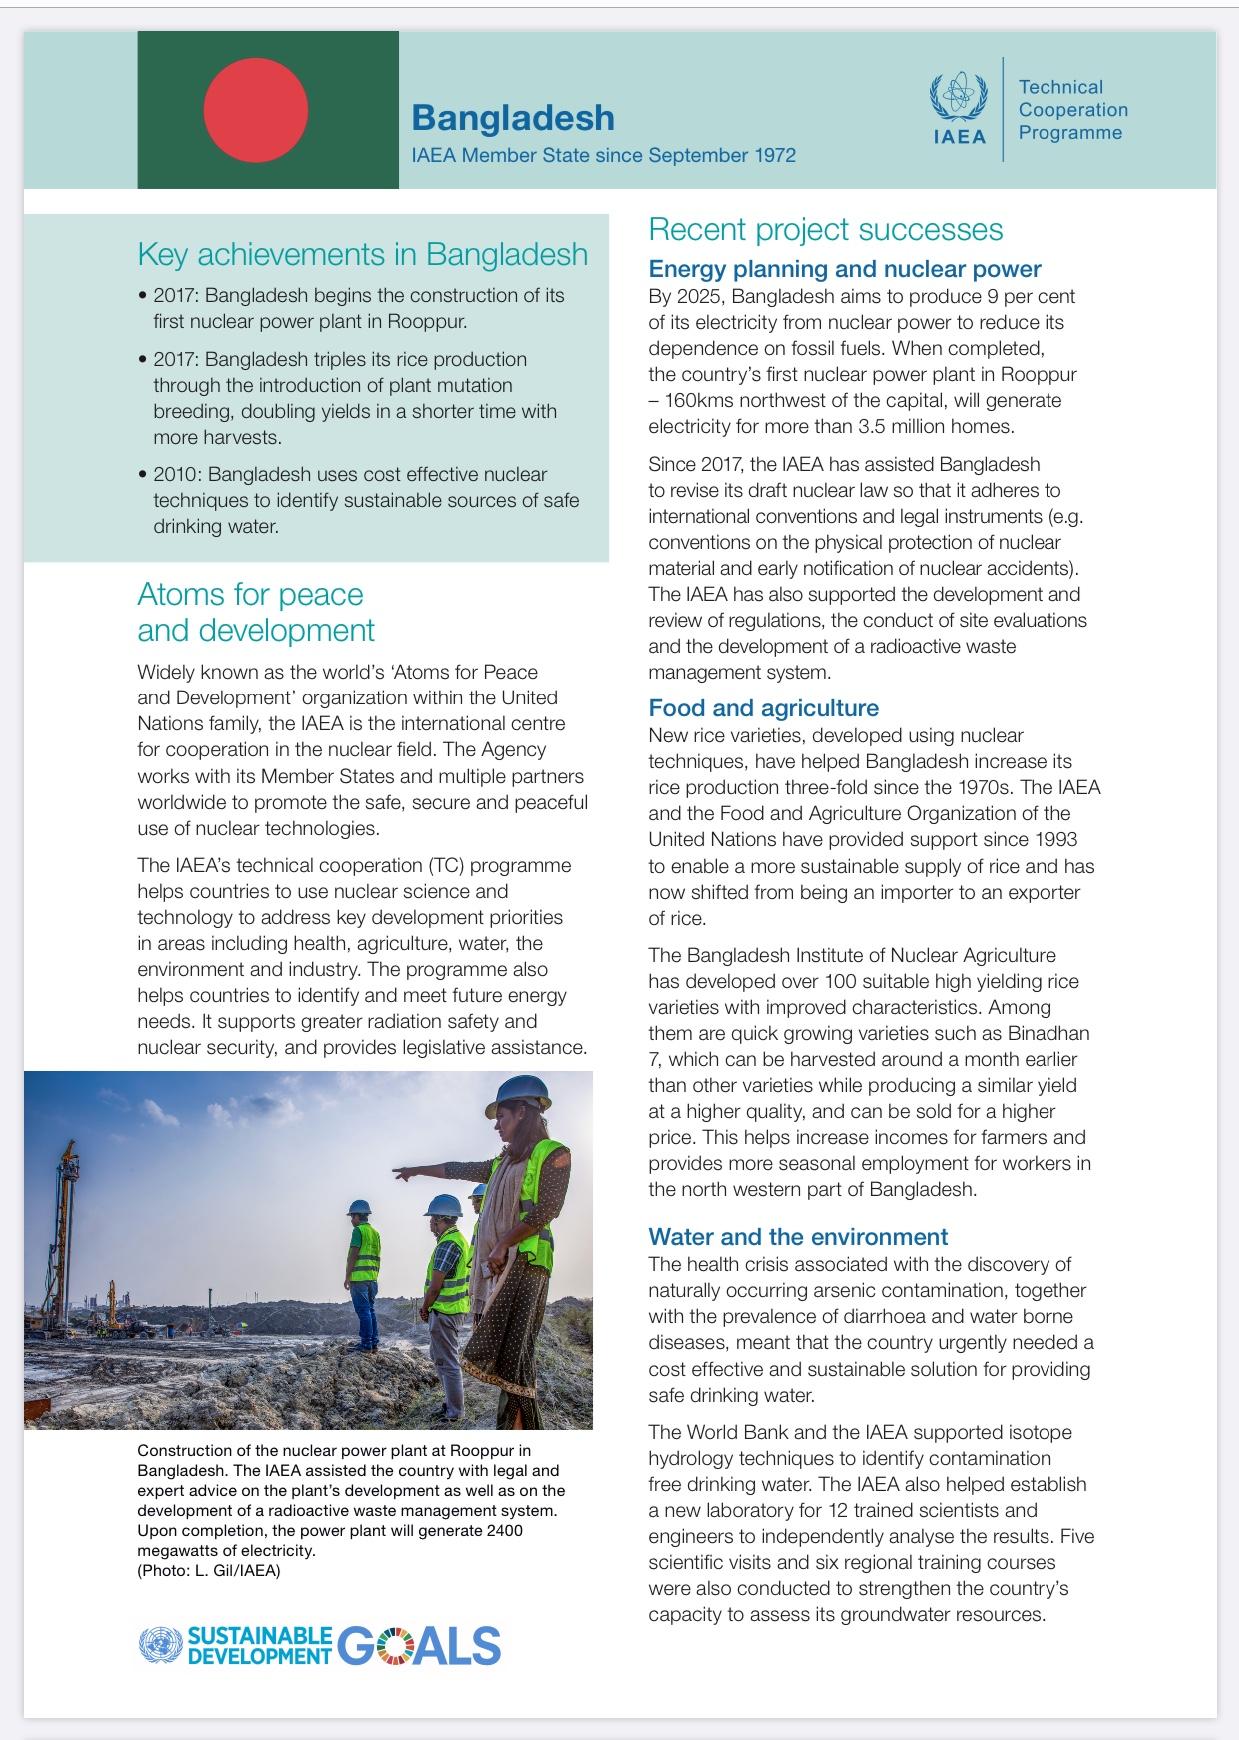 IAEA TC programme